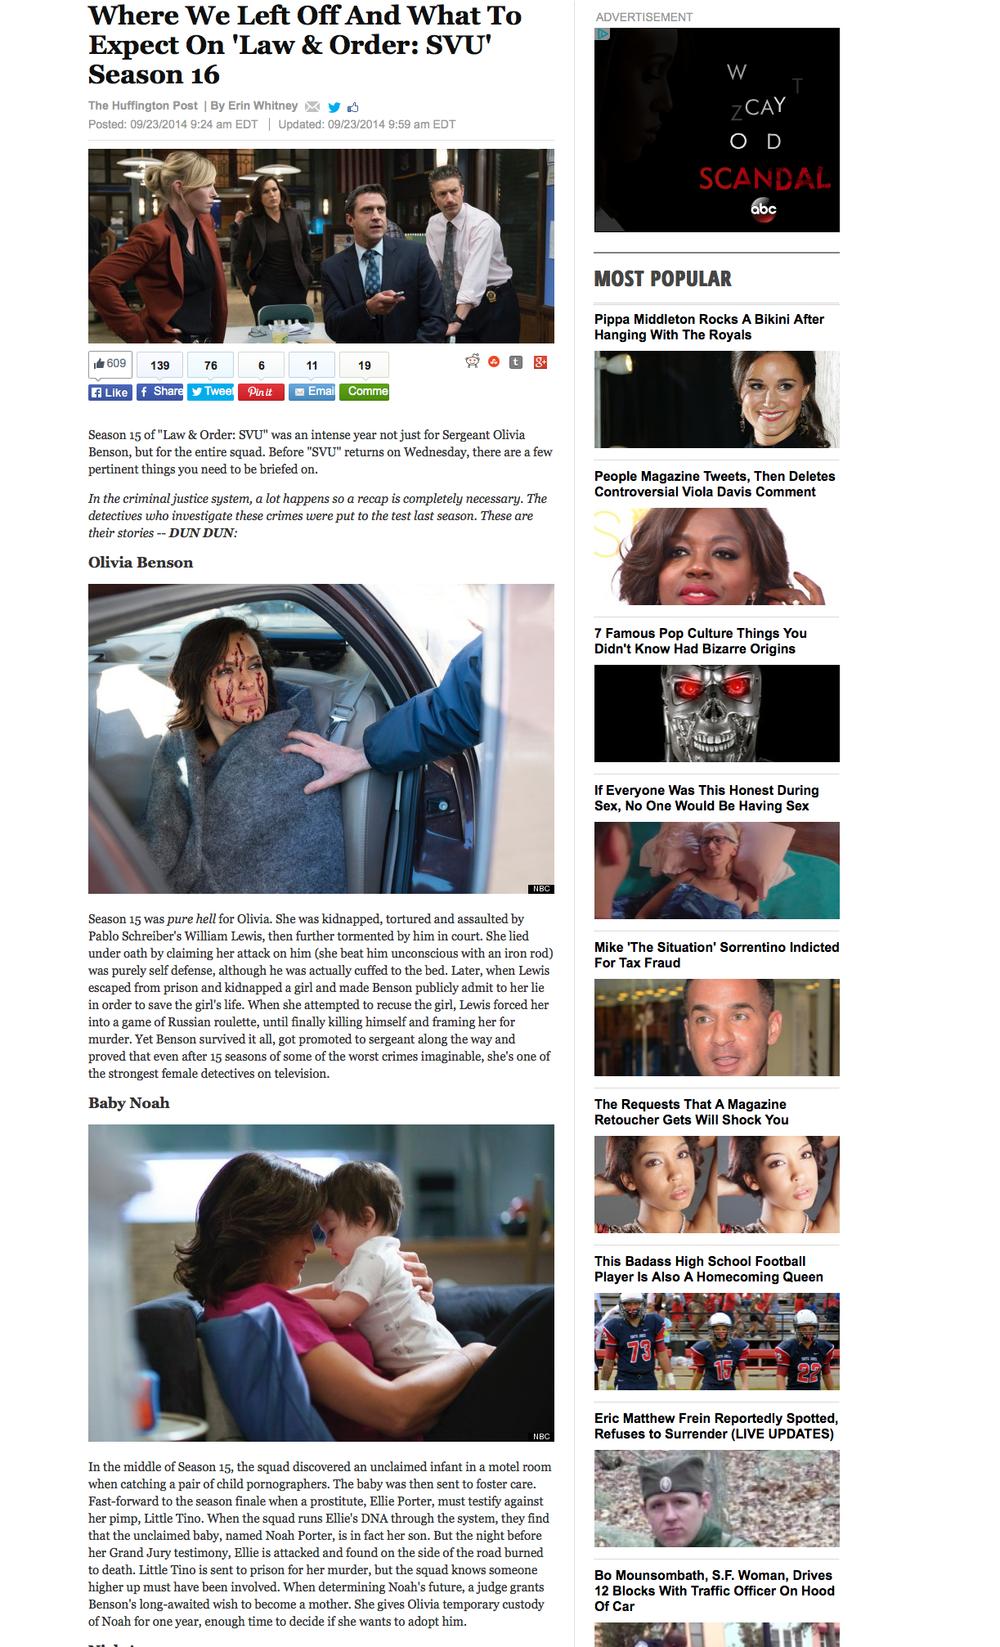 Screenshot 2014-09-26 16.01.06.png